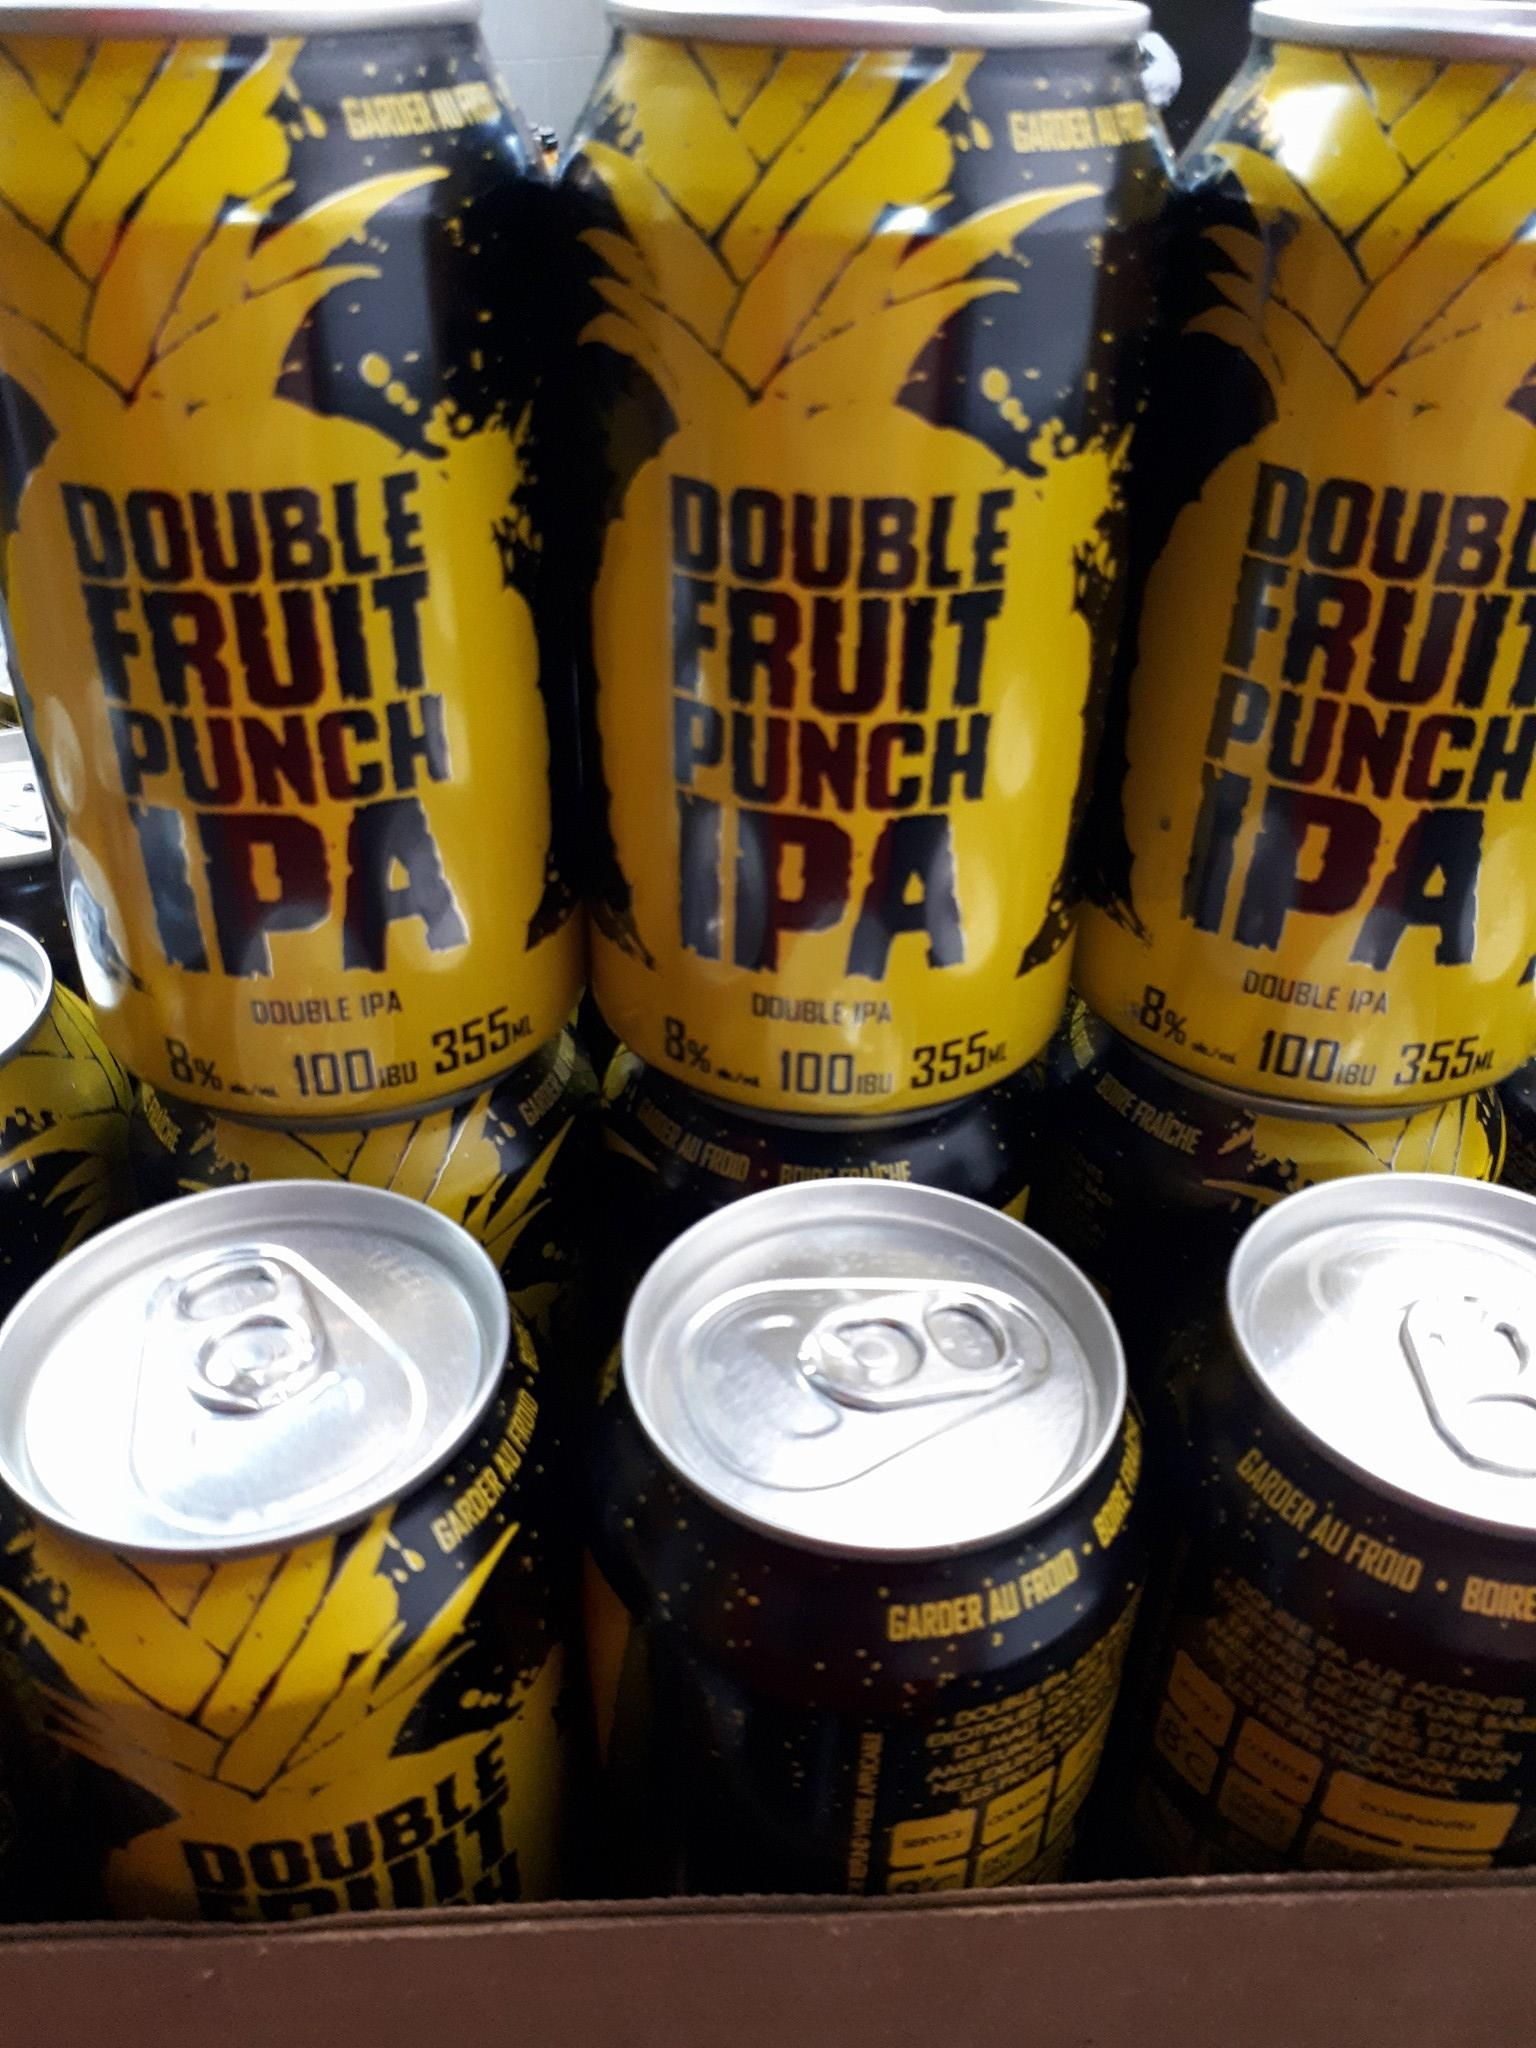 DOUBLE FRUIT PUNCH -